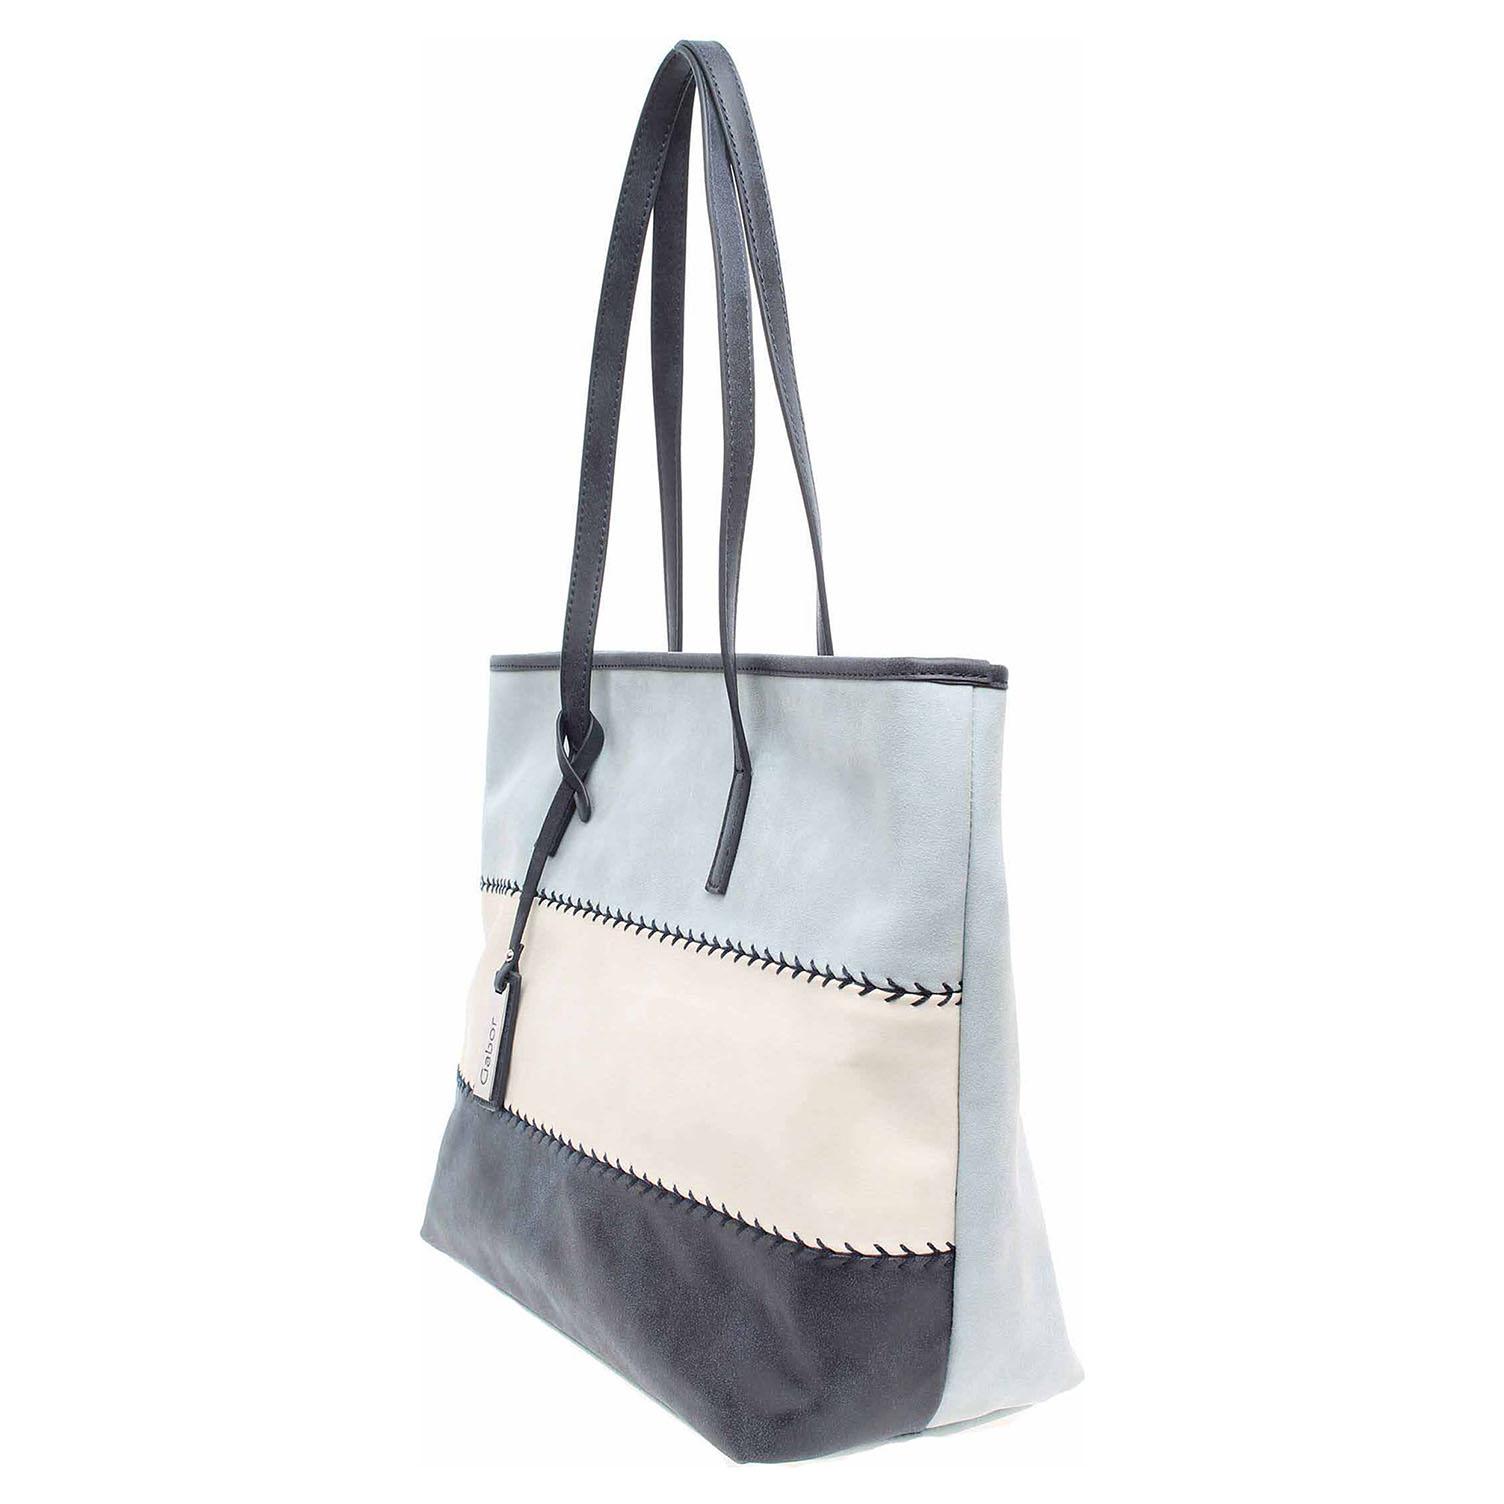 Ecco Gabor dámská kabelka 7657 50 Turin modrá 11891174